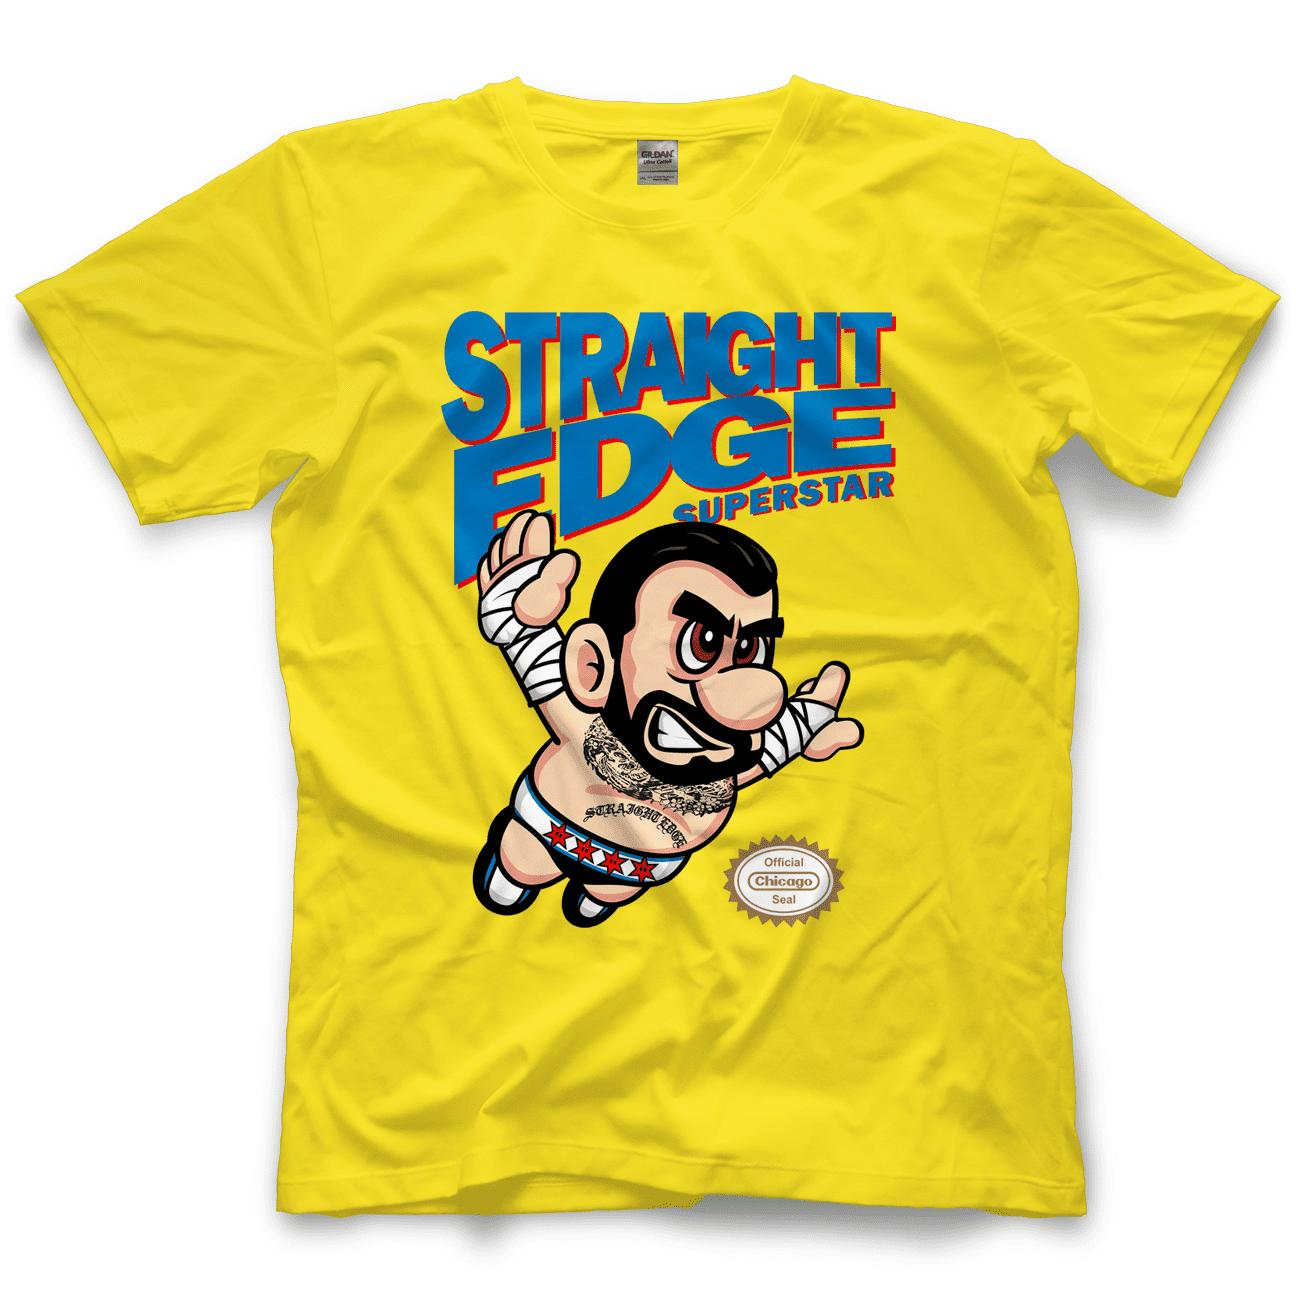 CM Punk Straight Edge Superstar John Cena SummerSlam 2021 Copy T-Shirt